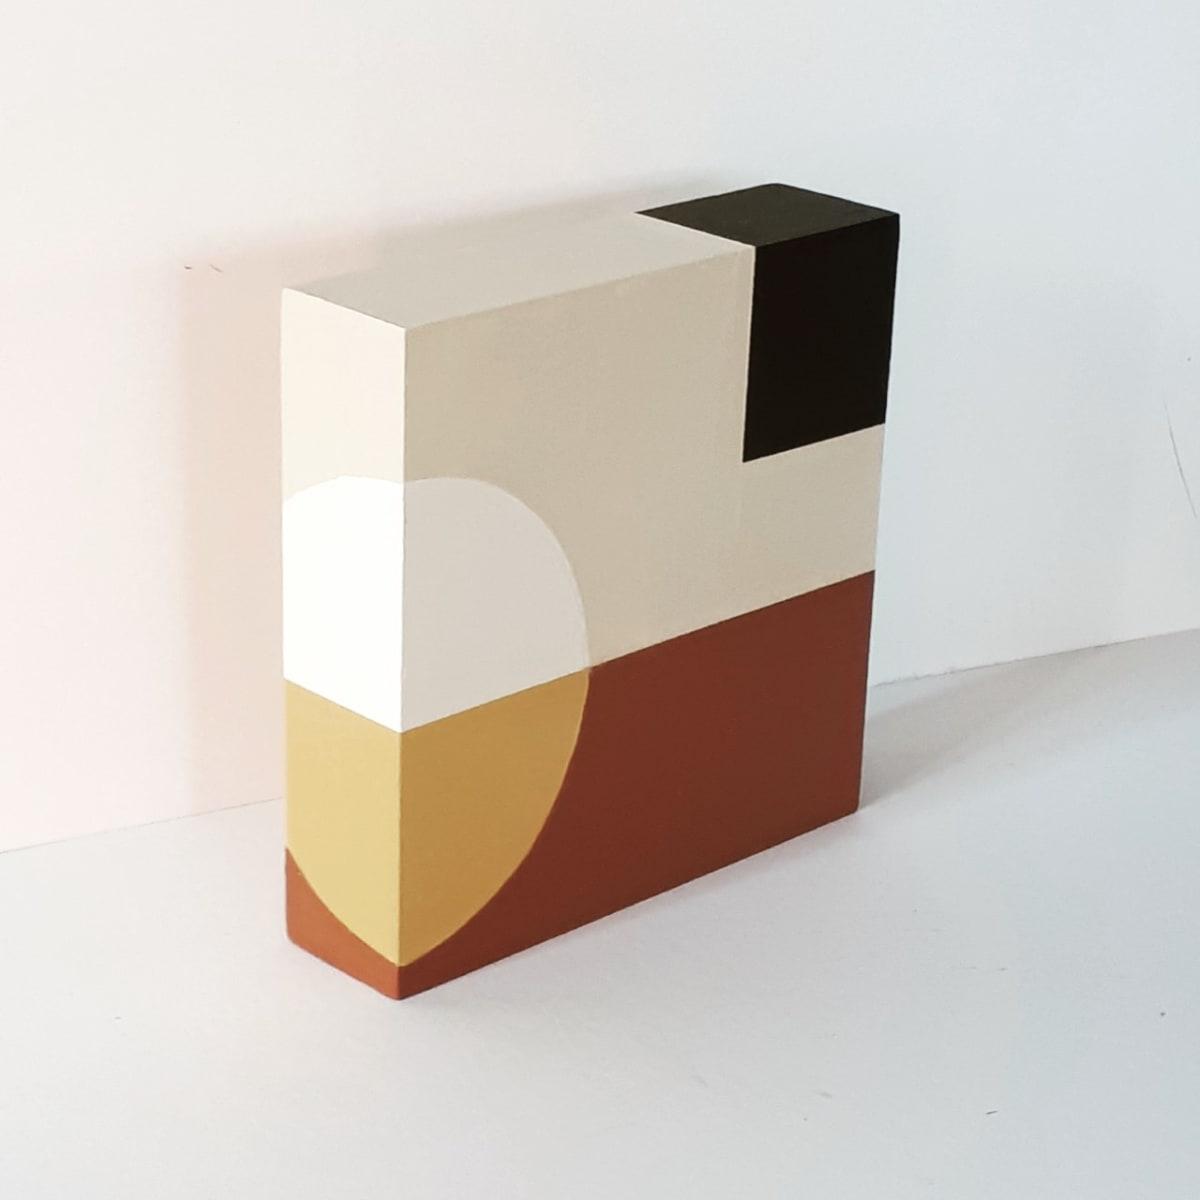 HIG093, Chocolate Creams by Christine Highland